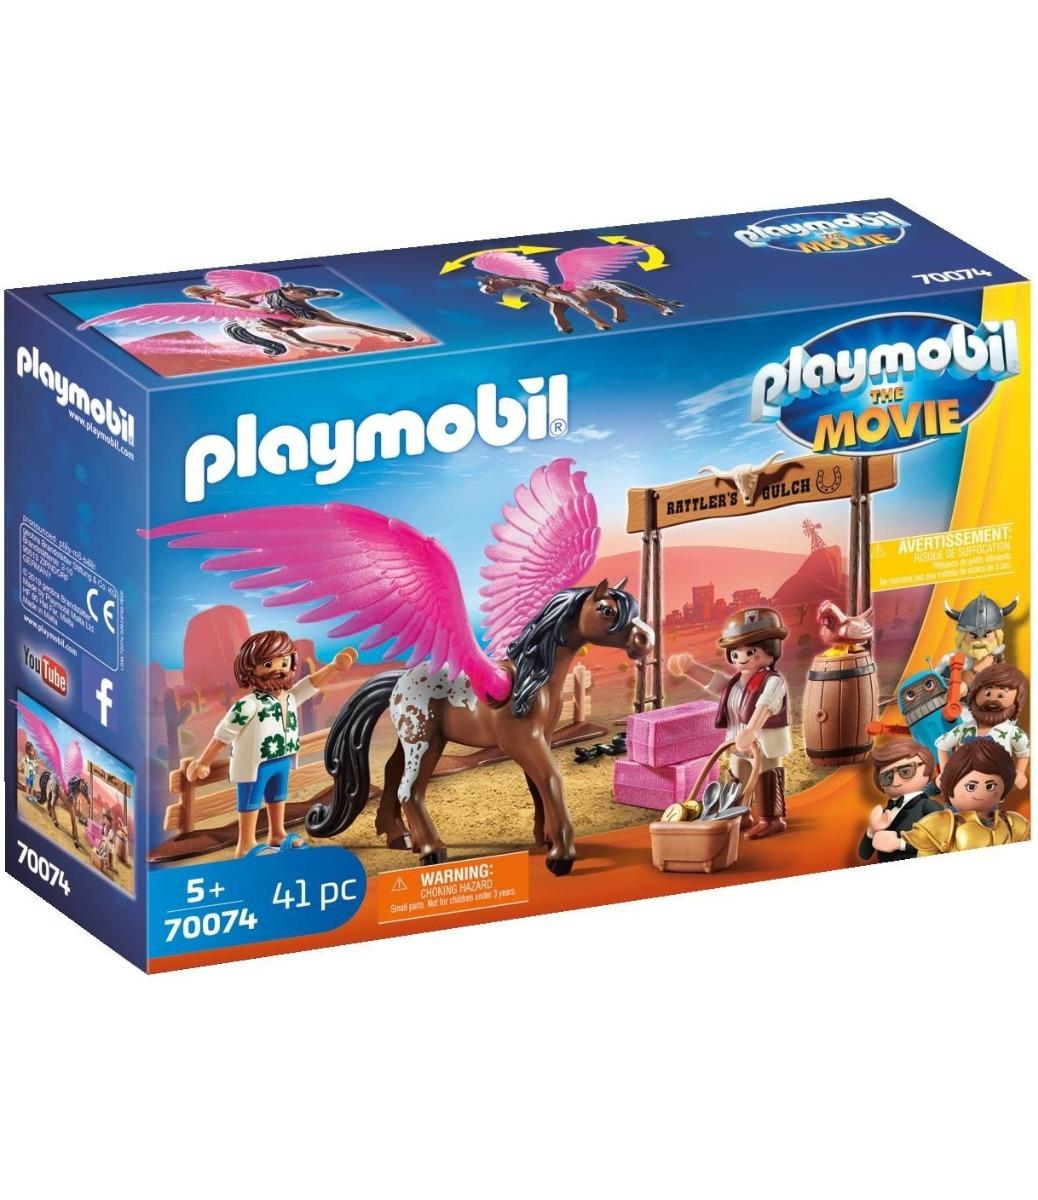 Playmobil PM70074 Marla, Del Si Calul Inaripat imagine hippoland.ro